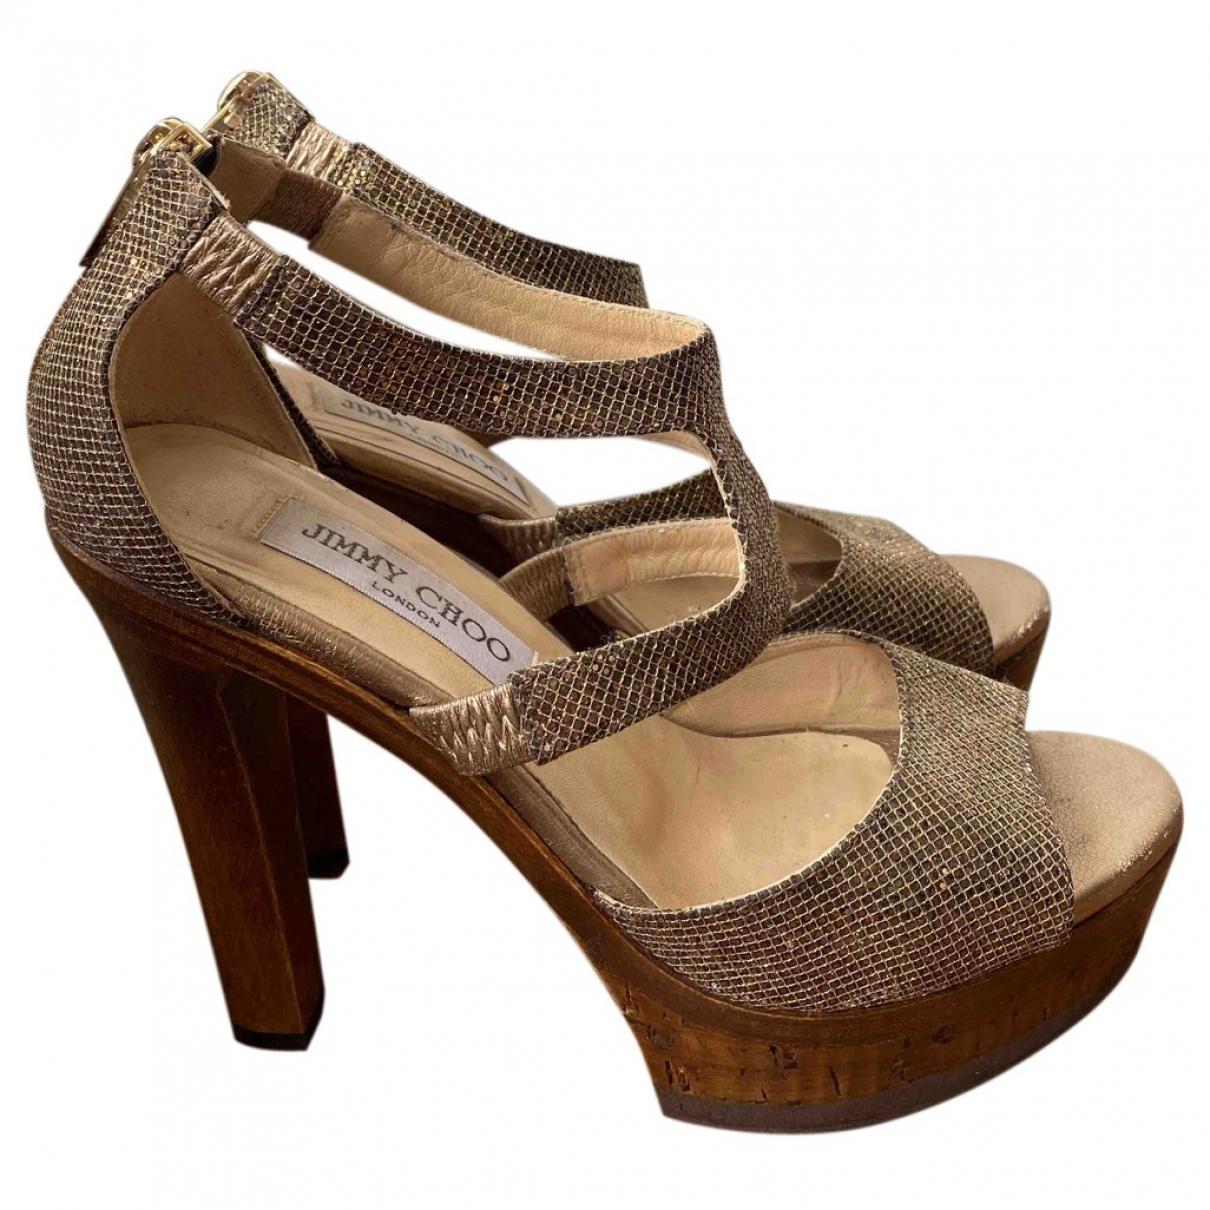 Jimmy Choo \N Gold Leather Sandals for Women 36.5 EU